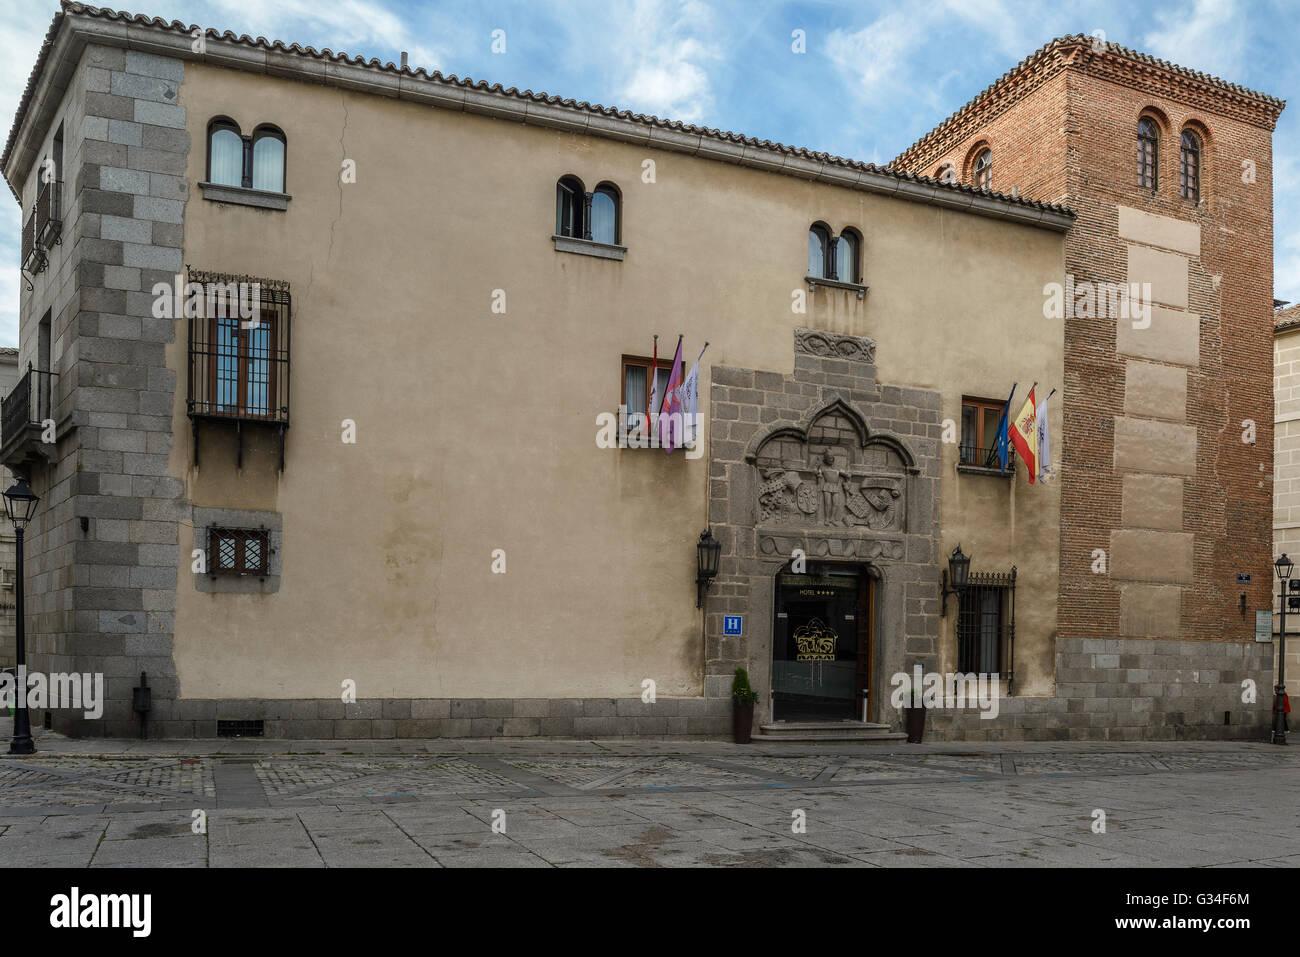 Valderrábanos lintel Palace, Where the stone reads the Templar motto 'Non nobis Domine, non nobis, sed - Stock Image